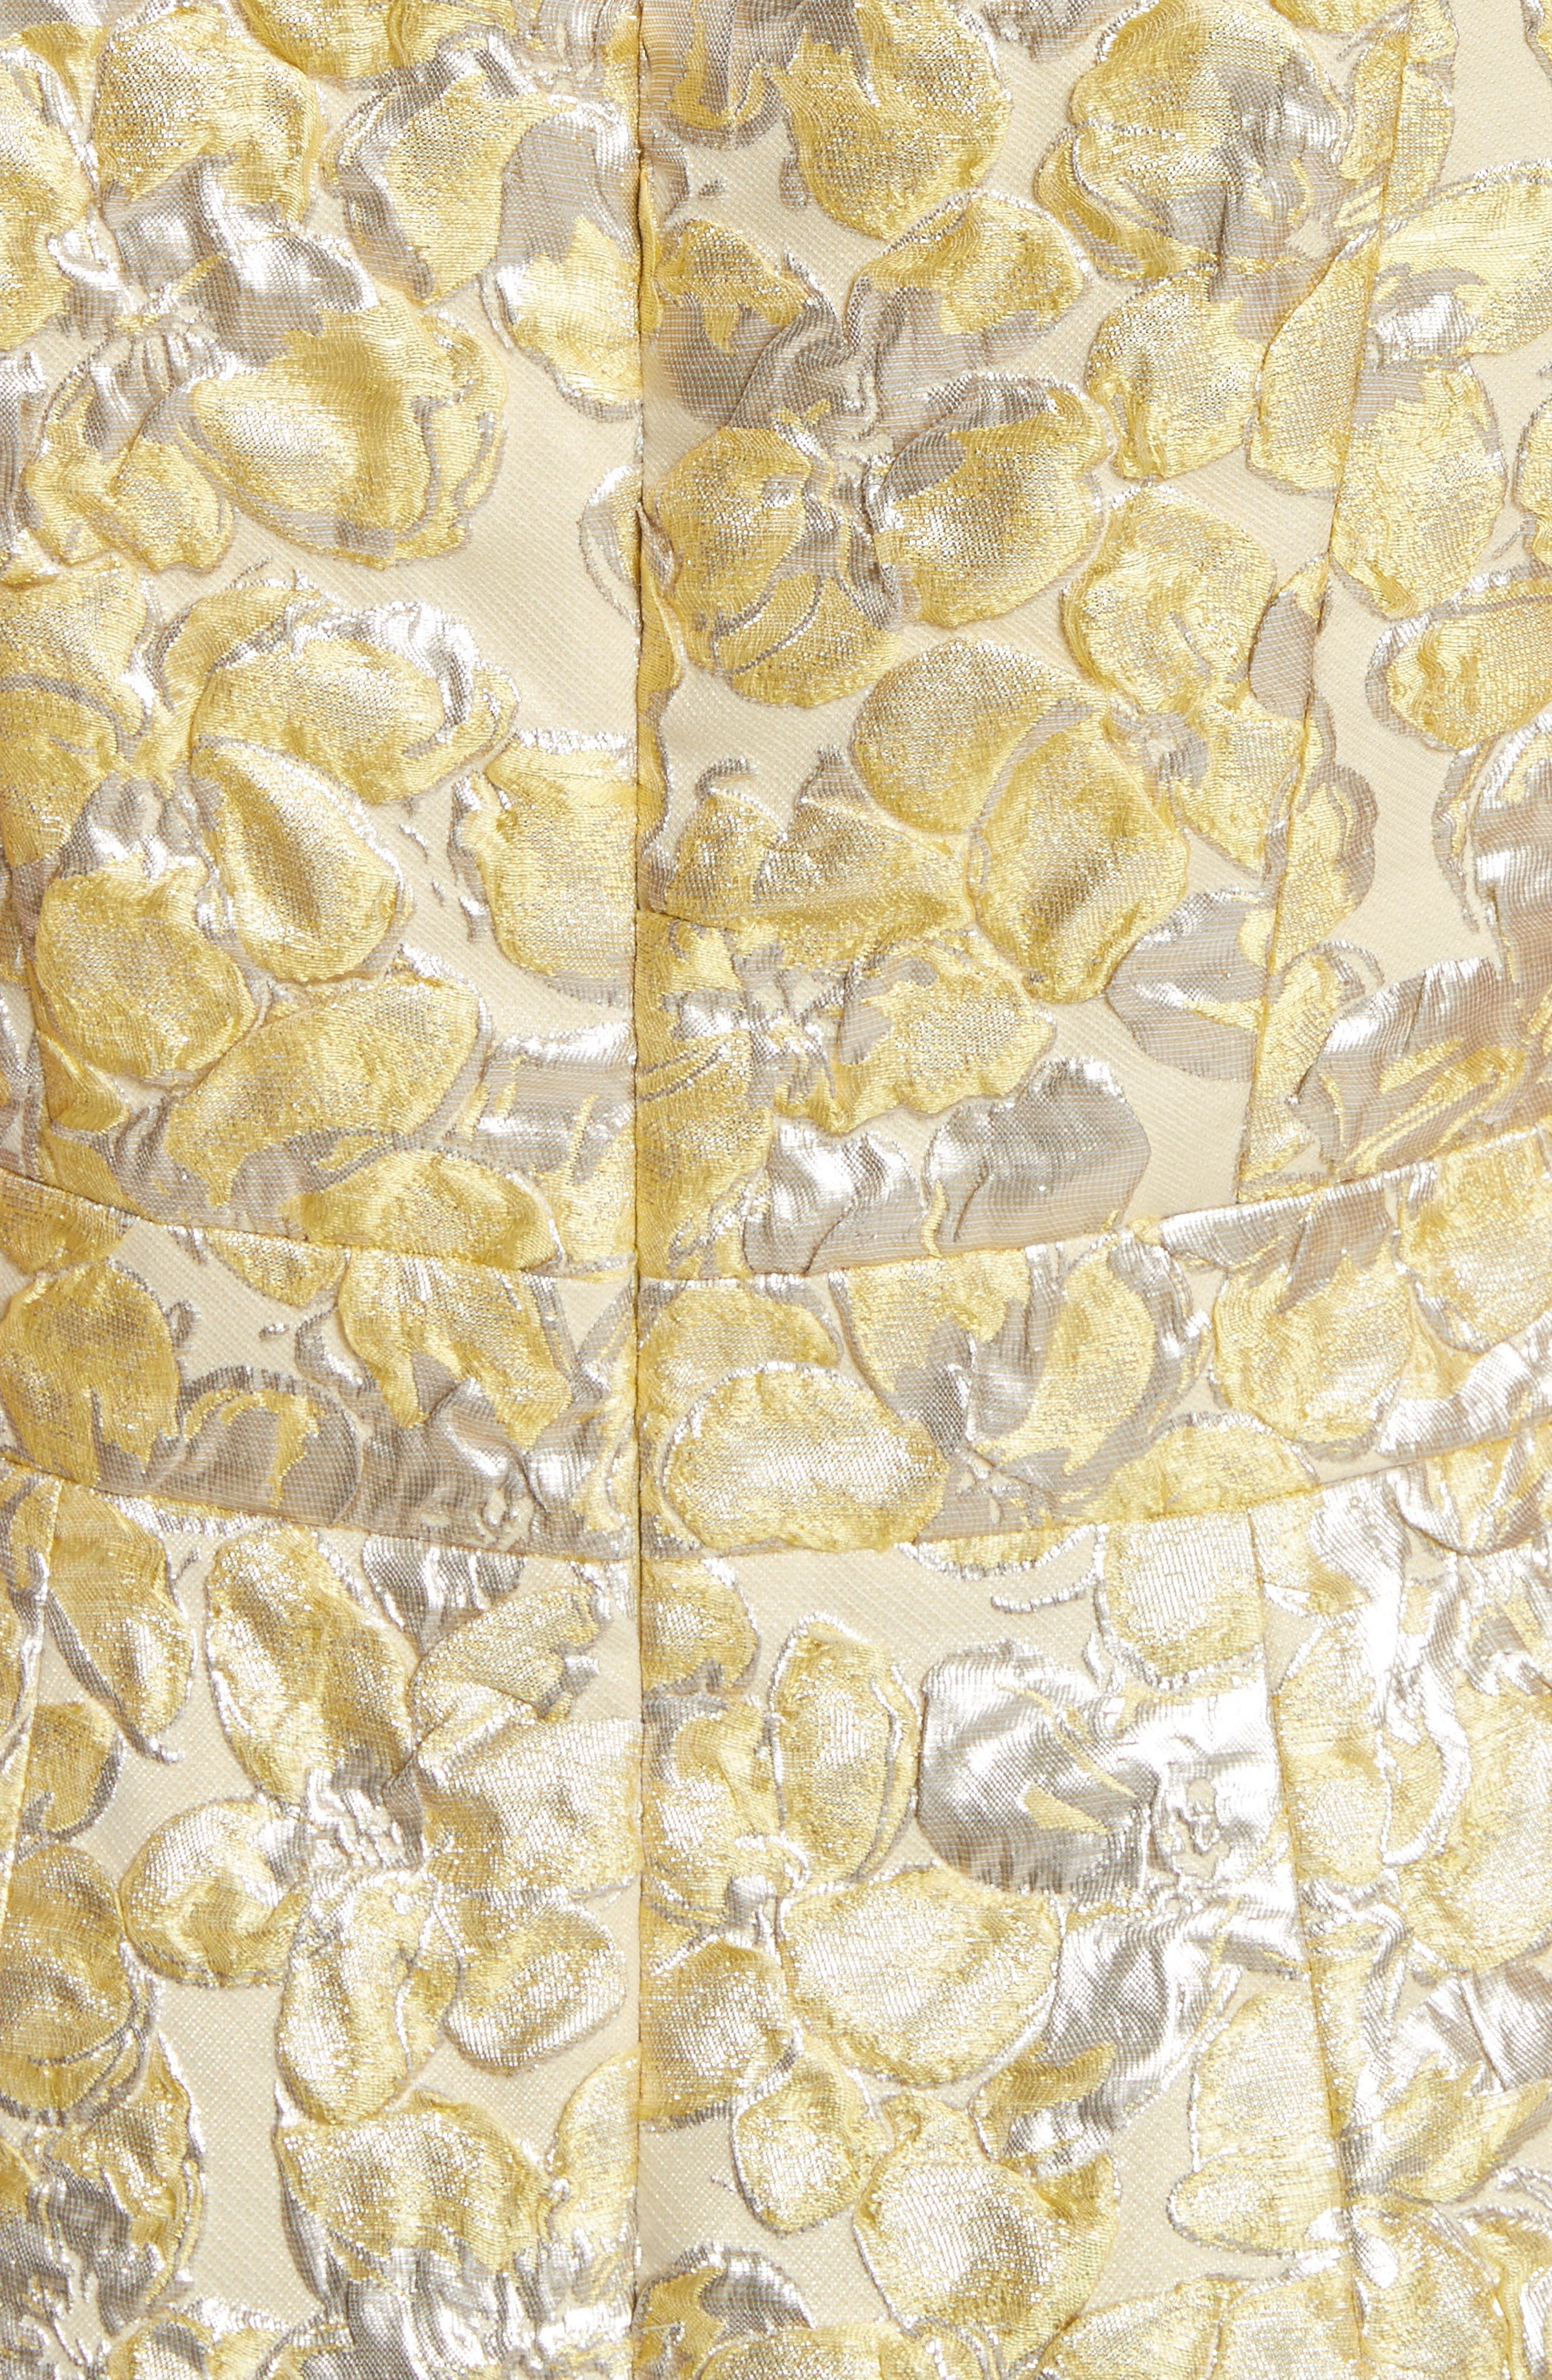 Metallic Floral Jacquard Dress,                             Alternate thumbnail 5, color,                             730